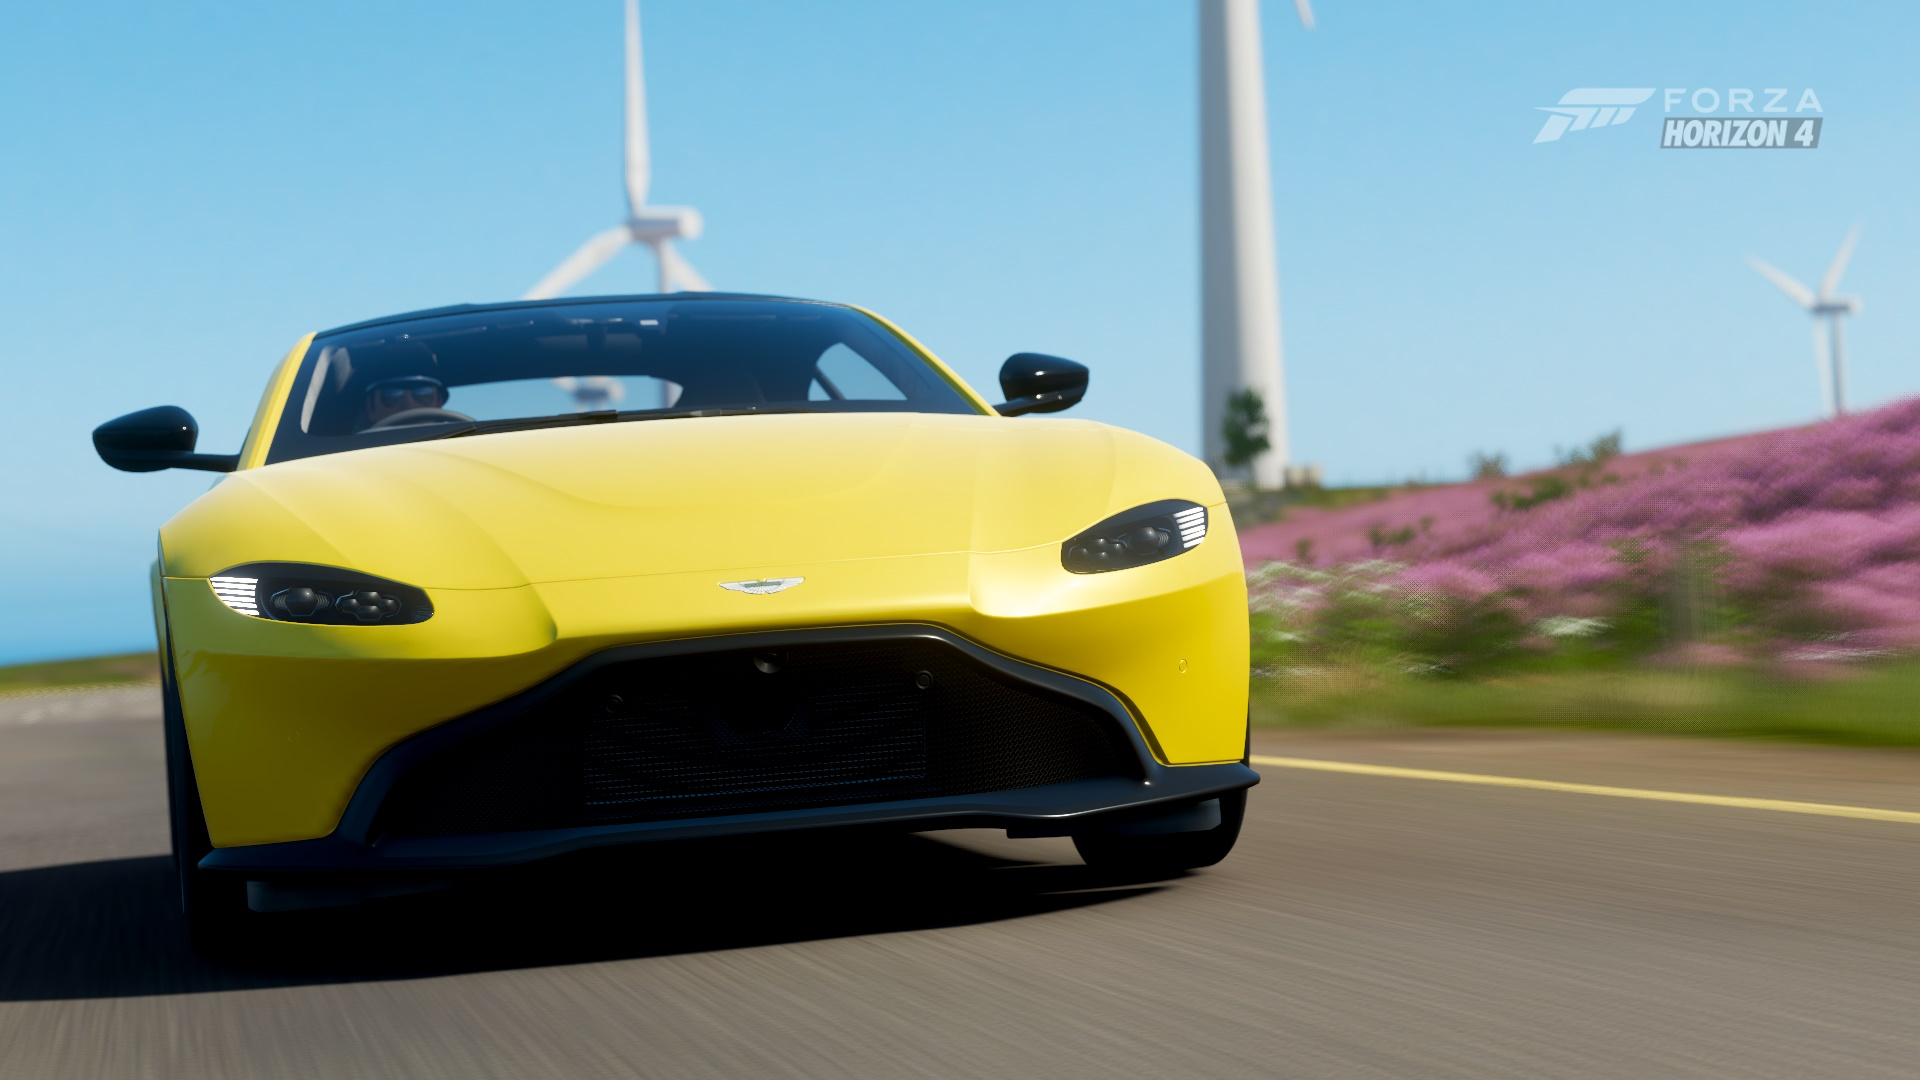 Aston Martin Vantage Forza Horizon 4 By Talex0211 On Deviantart